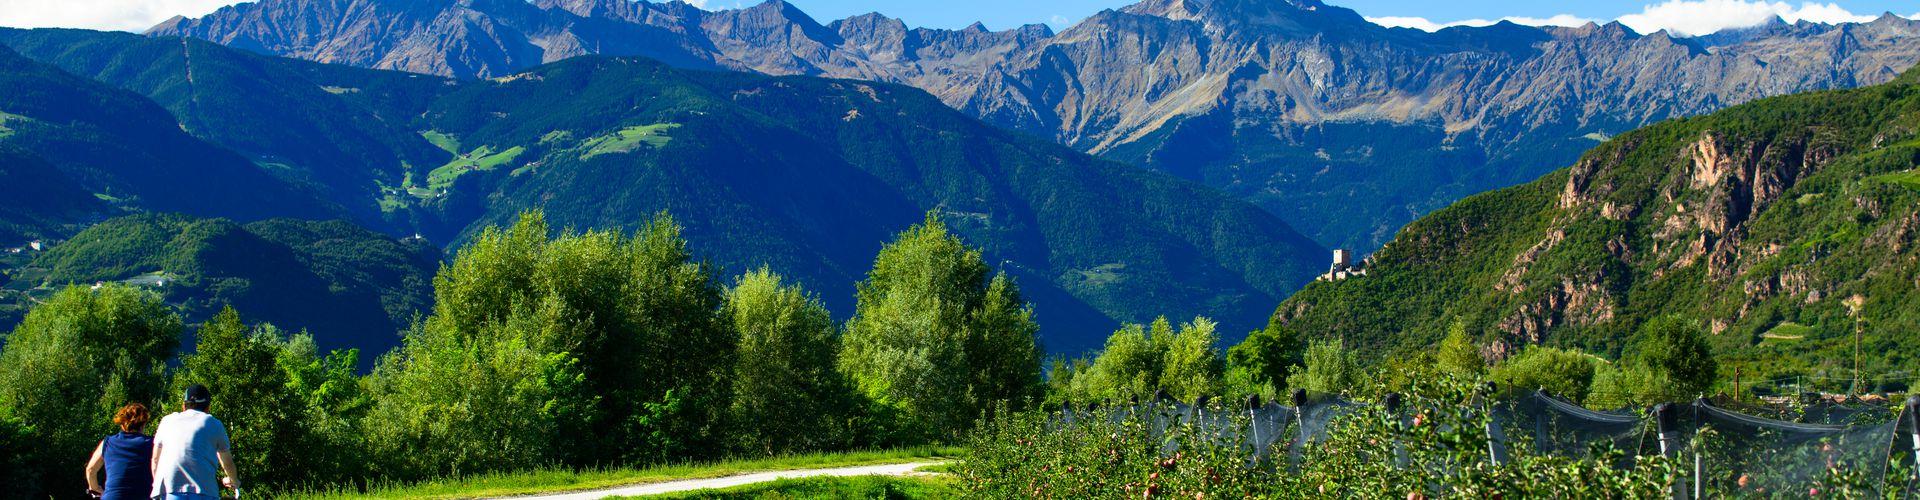 10 atemberaubende Routen entlang Eurovelos